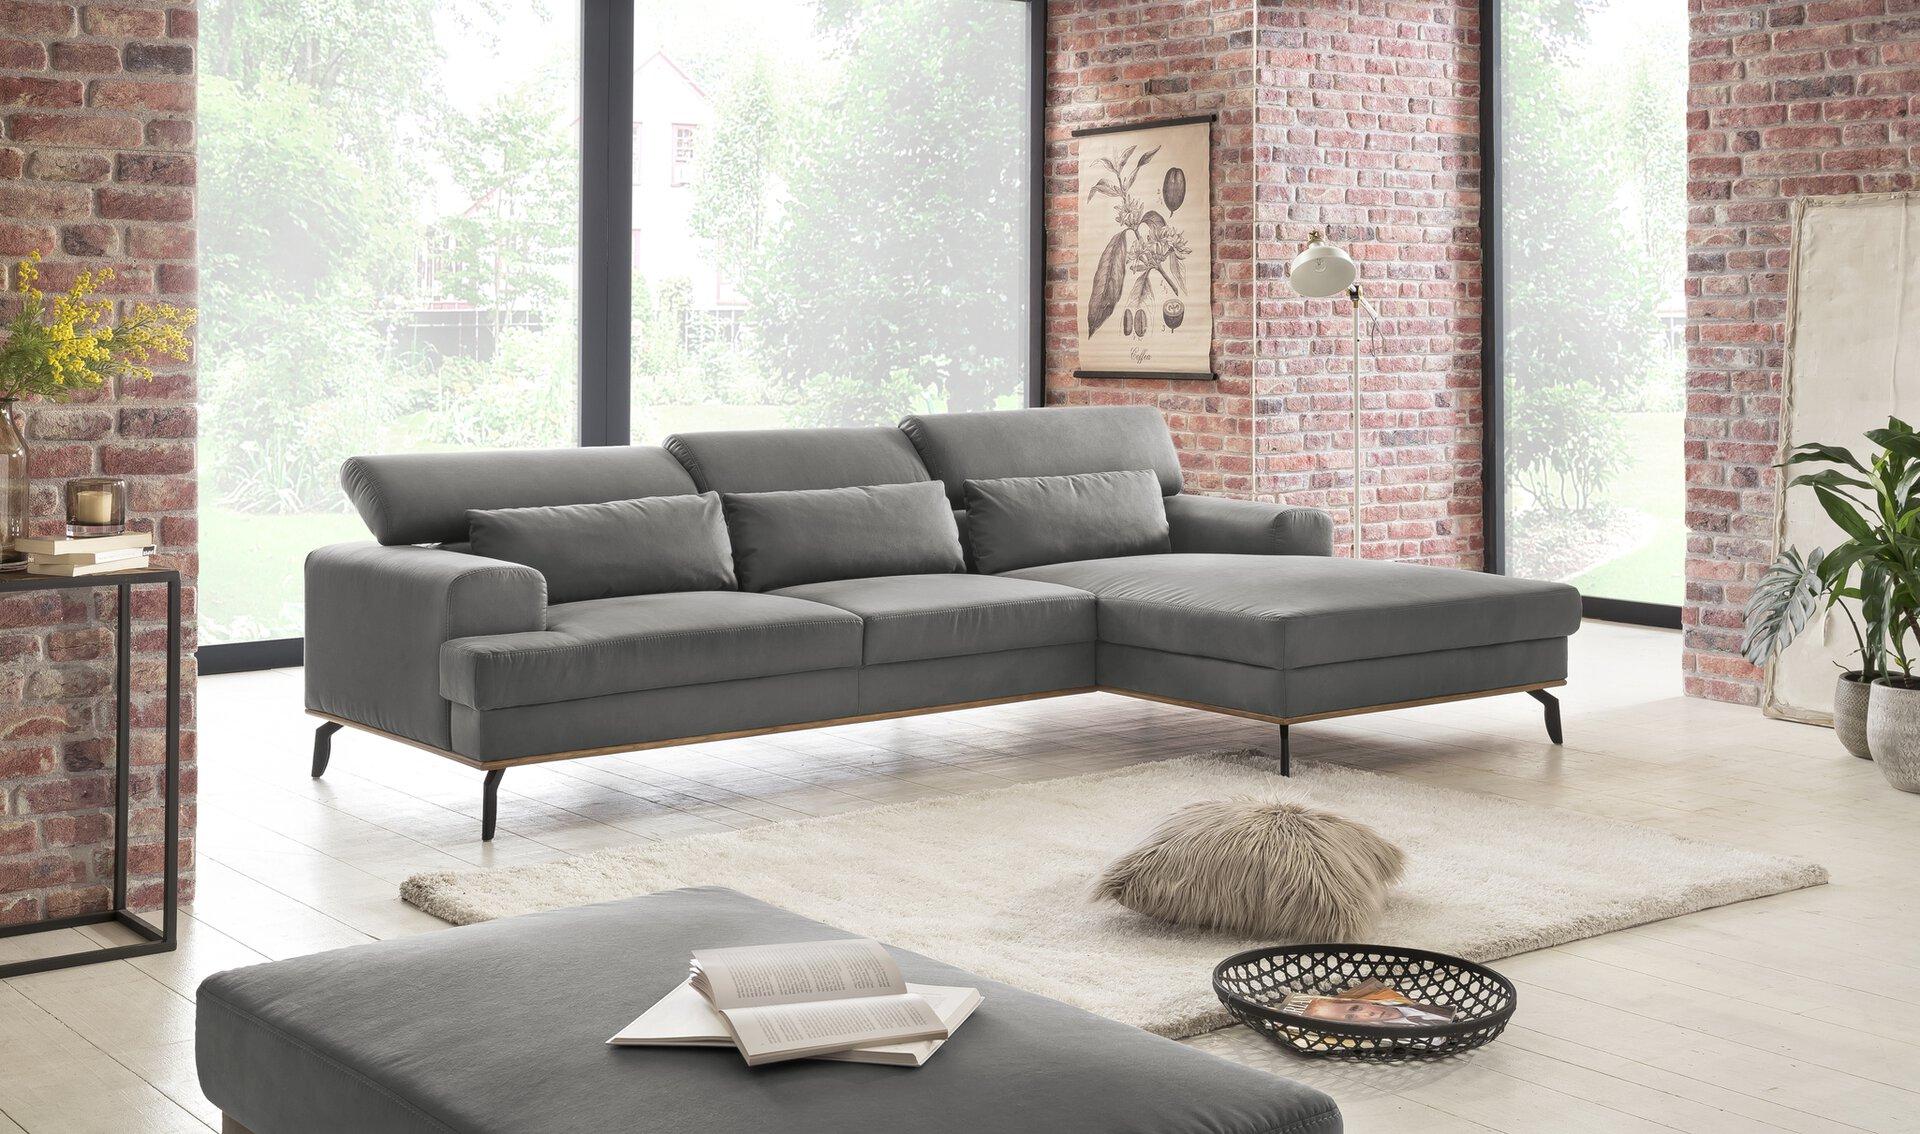 Ecksofa PEP Vito Textil grau 174 x 74 x 285 cm